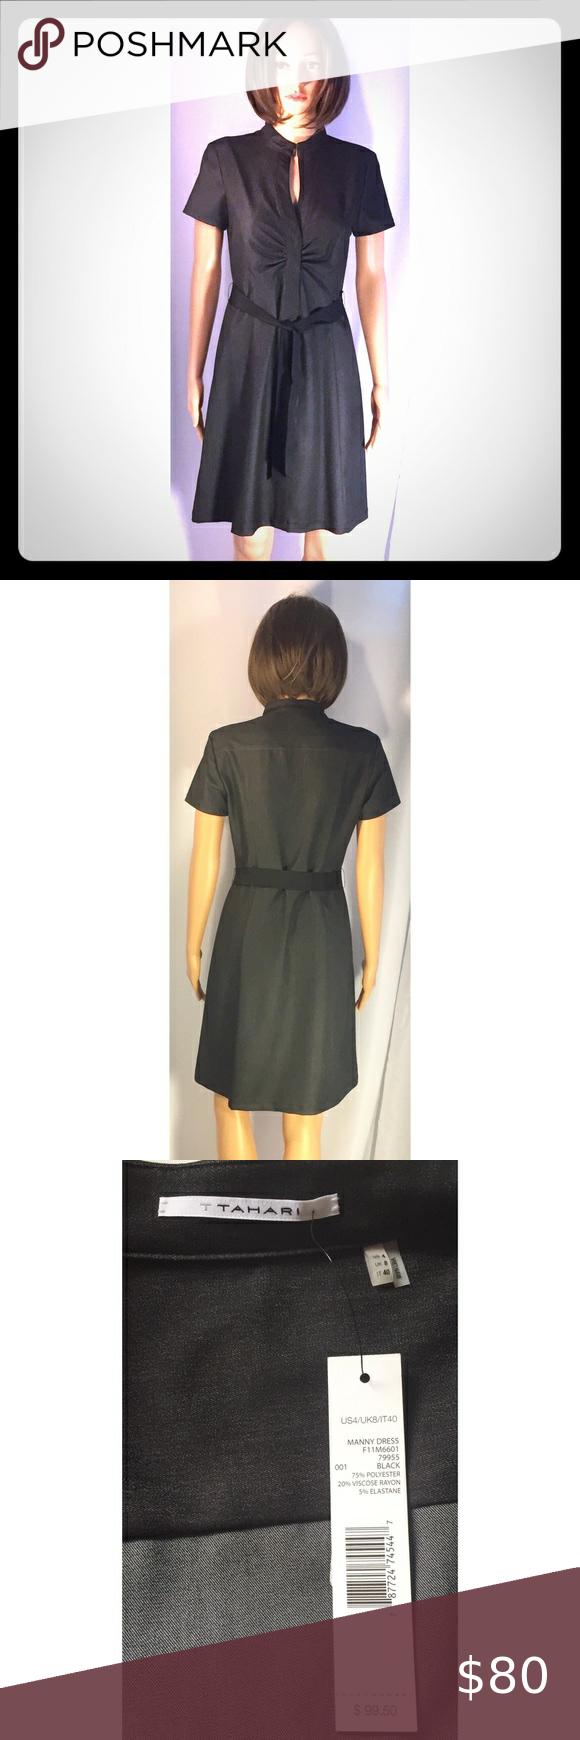 Tahari Black Manny Shirt Dress 4 Black Short Sleeve Dress Dresses Fit And Flare Dress [ 1740 x 580 Pixel ]